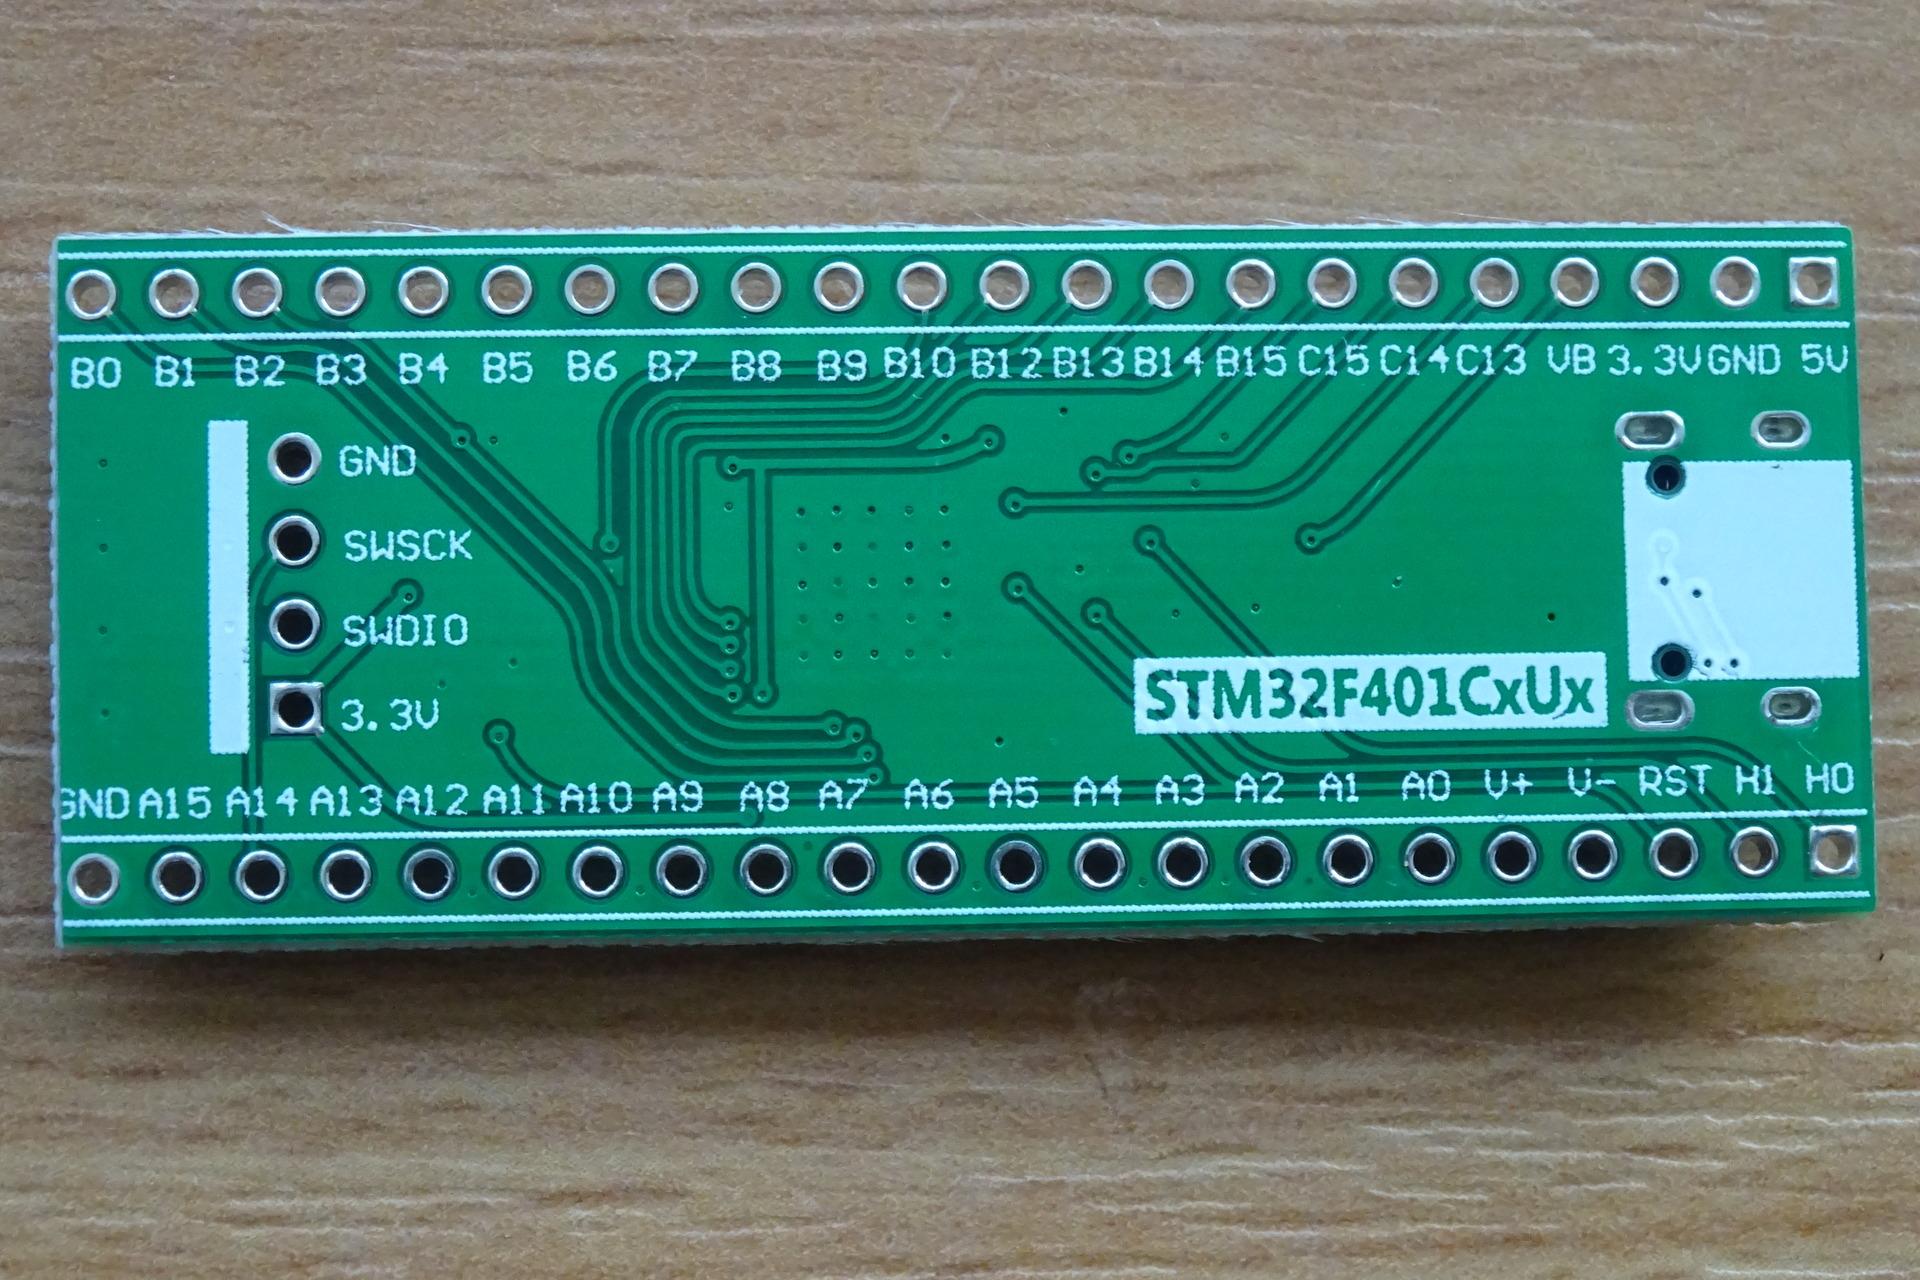 STM32 Mini F401: Bottom view (no headers)